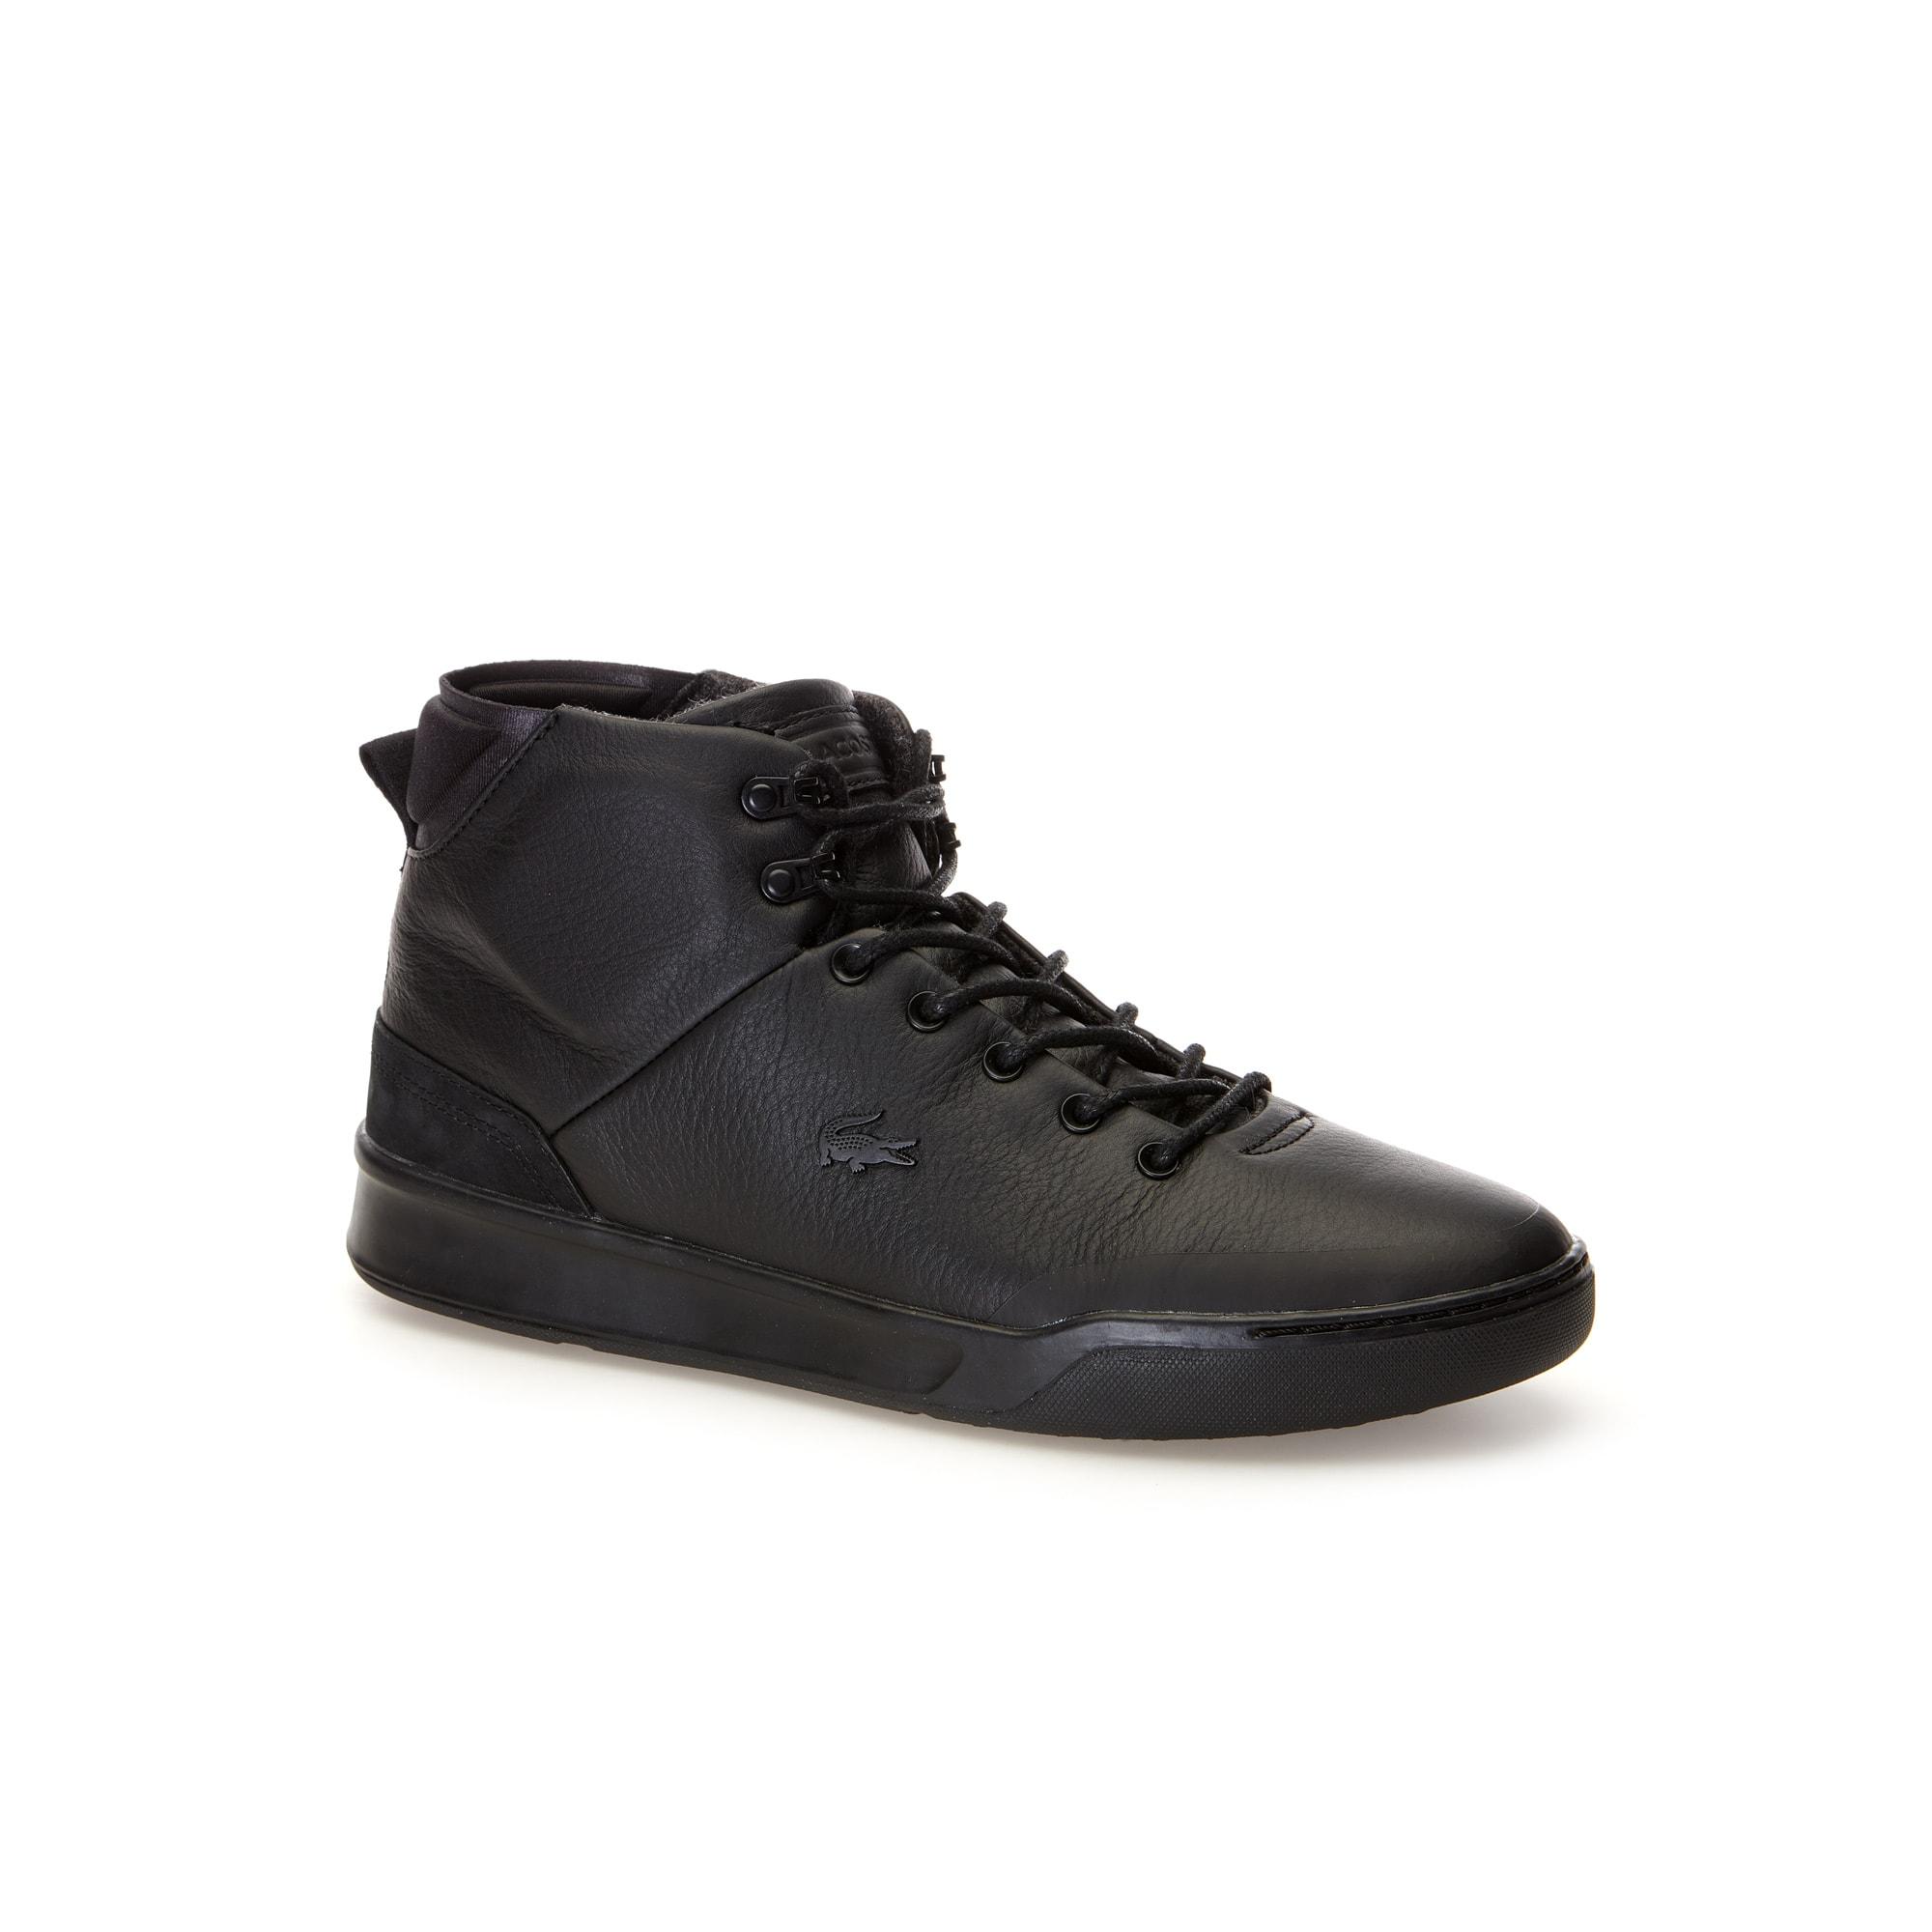 Men's Explorateur Classic Black Tumbled High-top Leather Trainers